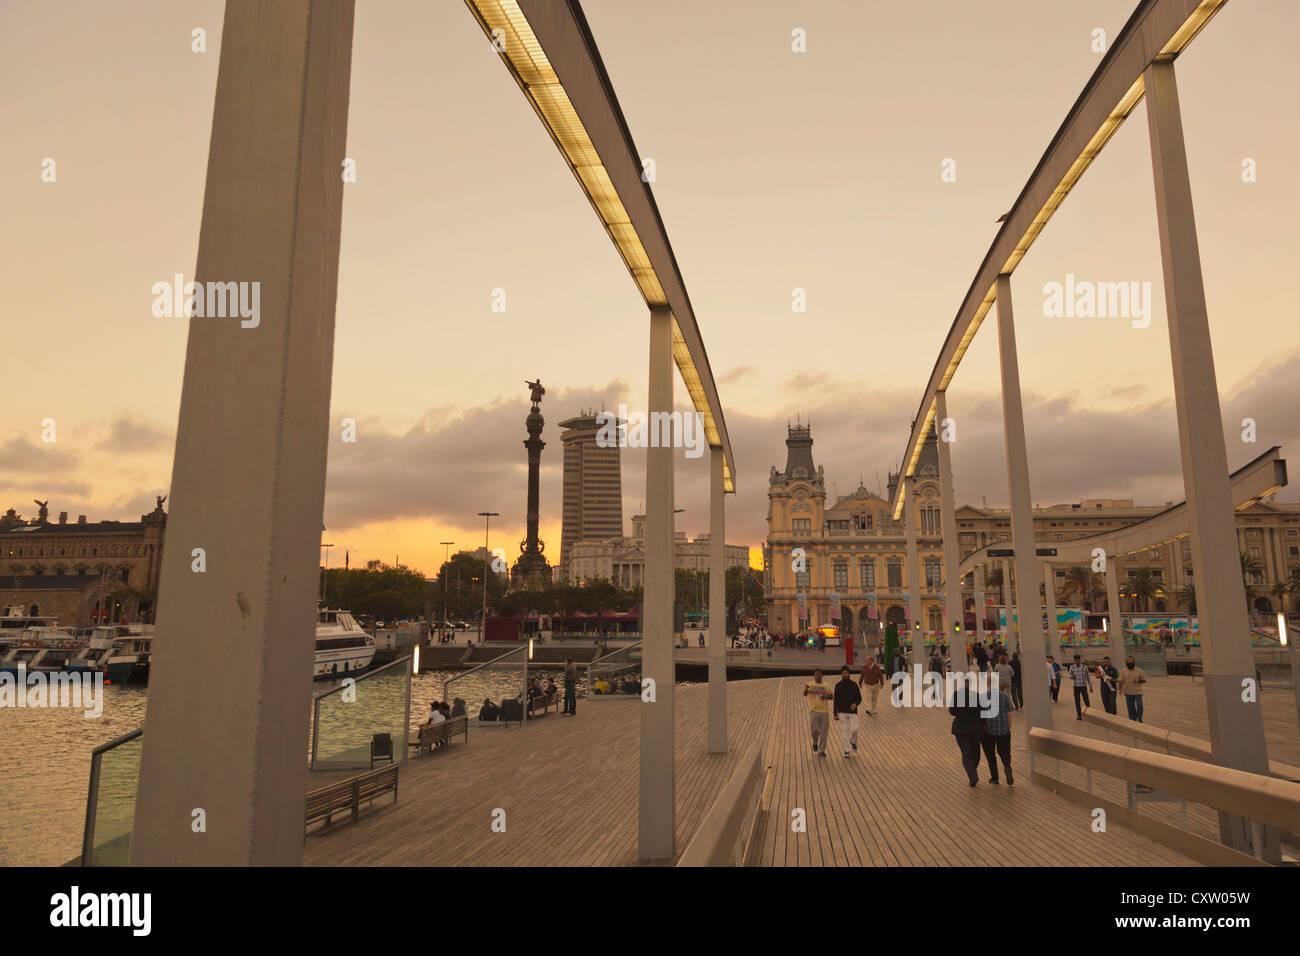 Barcelona, Spain. Waterfront seen from Rambla de Mar. - Stock Image